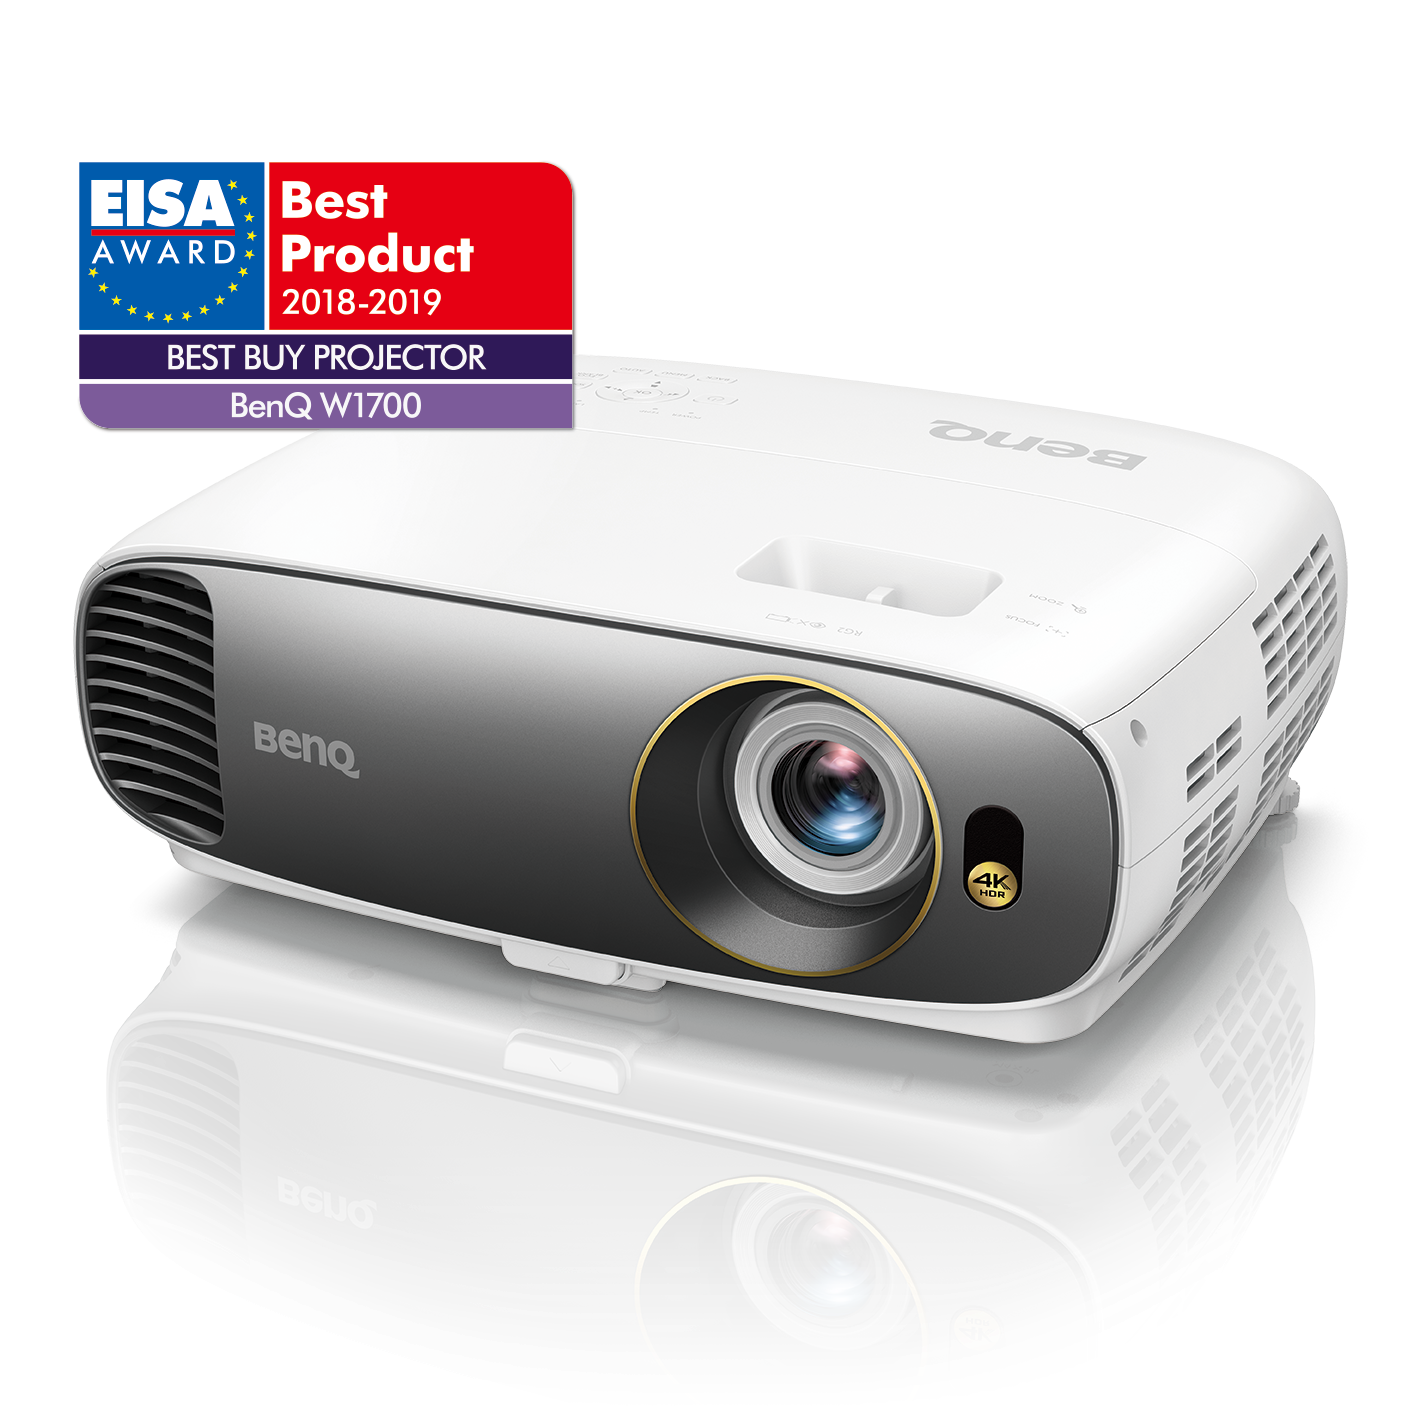 BenQ W1700 câștigă prestigioasa distincţie EISA Best Buy Projector 2018-2019